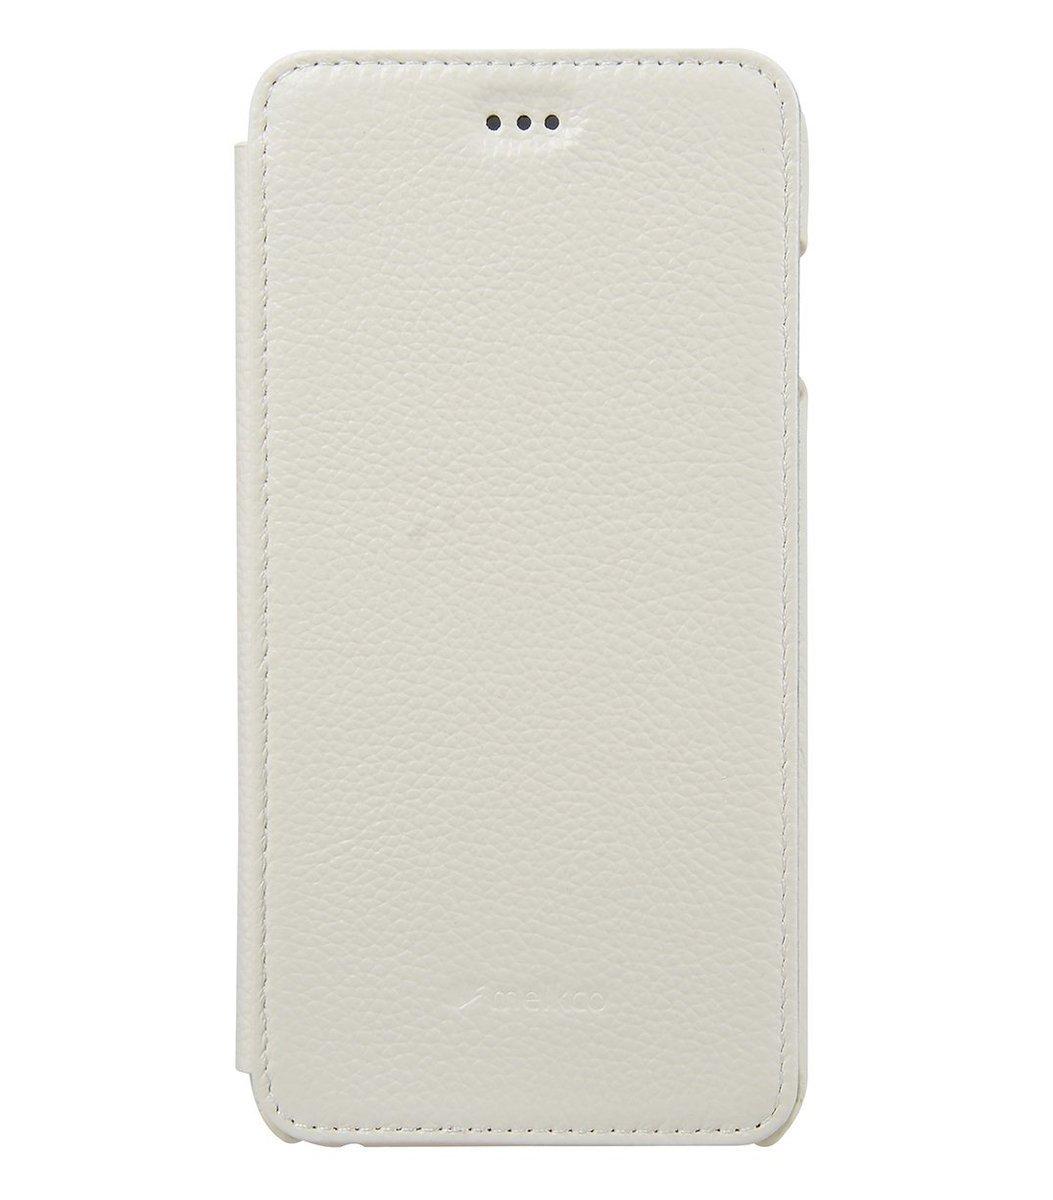 "Apple iPhone 6/6S (4.7"") Face cover book 高級真皮革手機套 (白色荔枝條紋)"